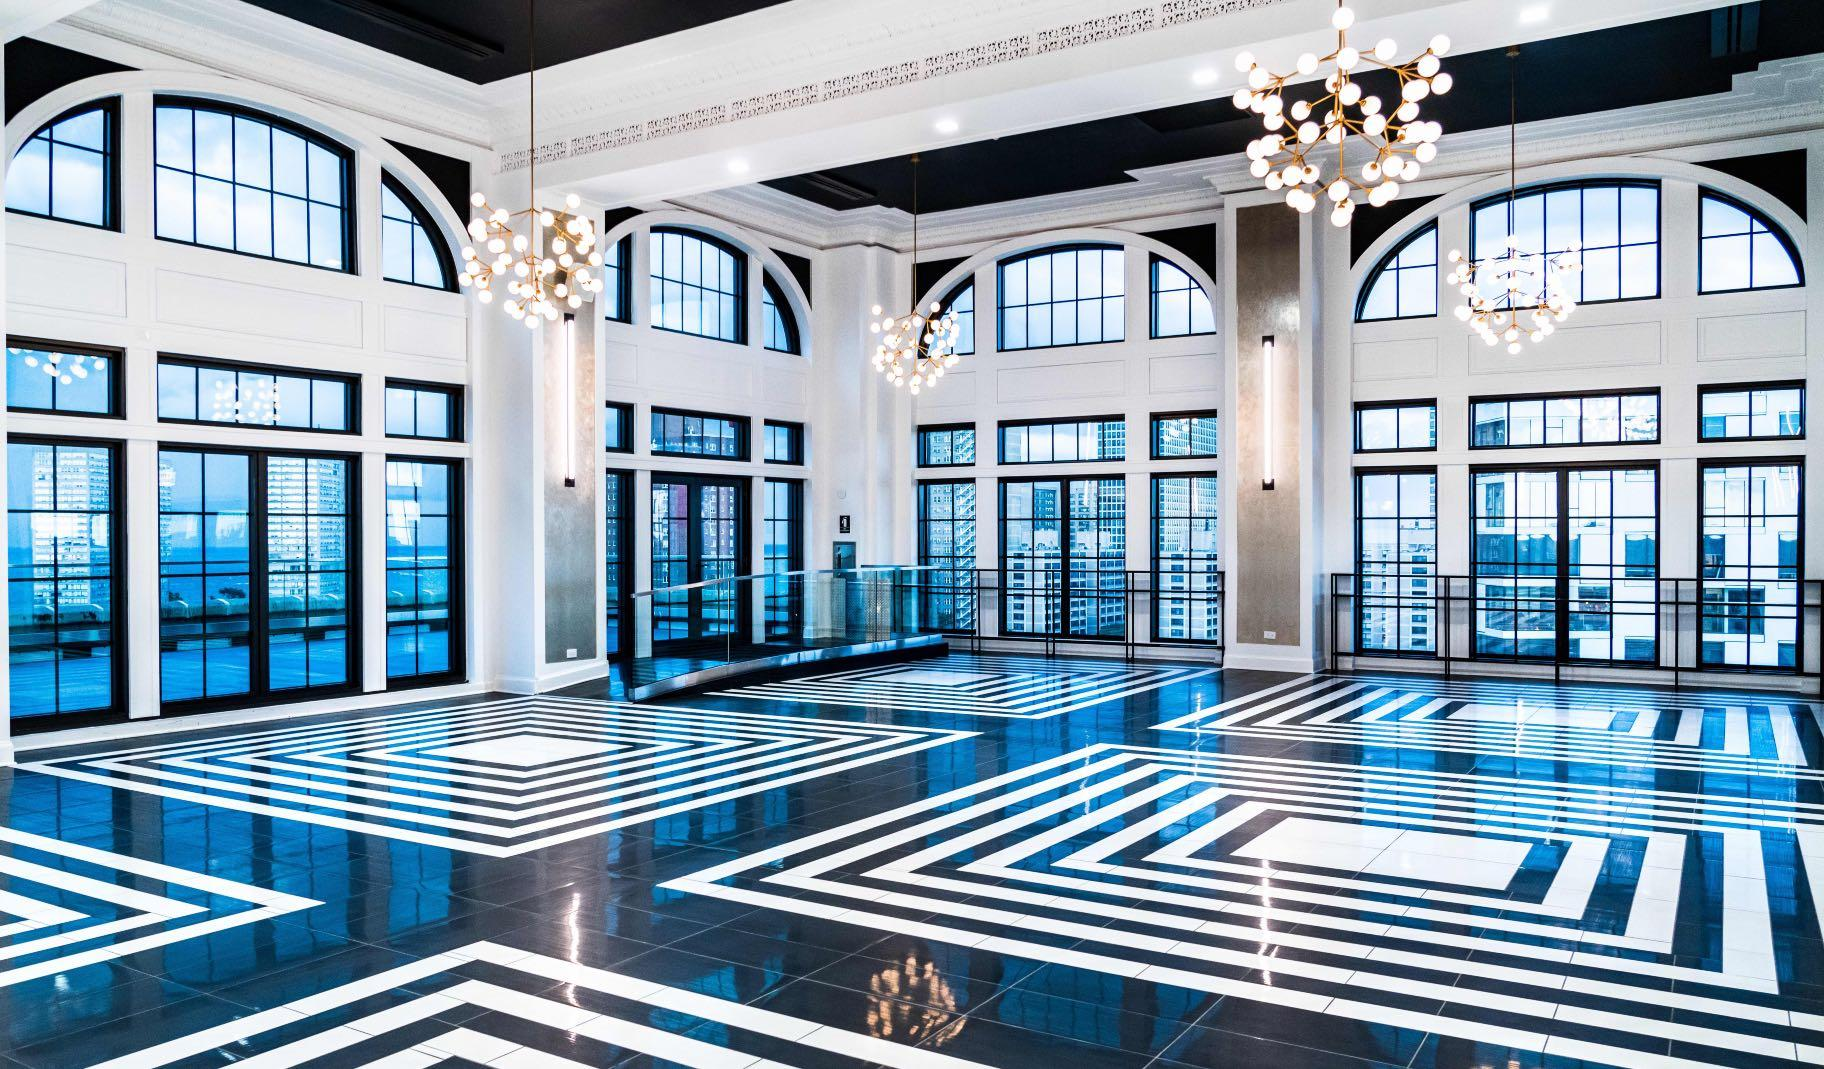 Penthouse in Hyde Park.  (Chicago Architecture Center / Anna Munzesheimer)